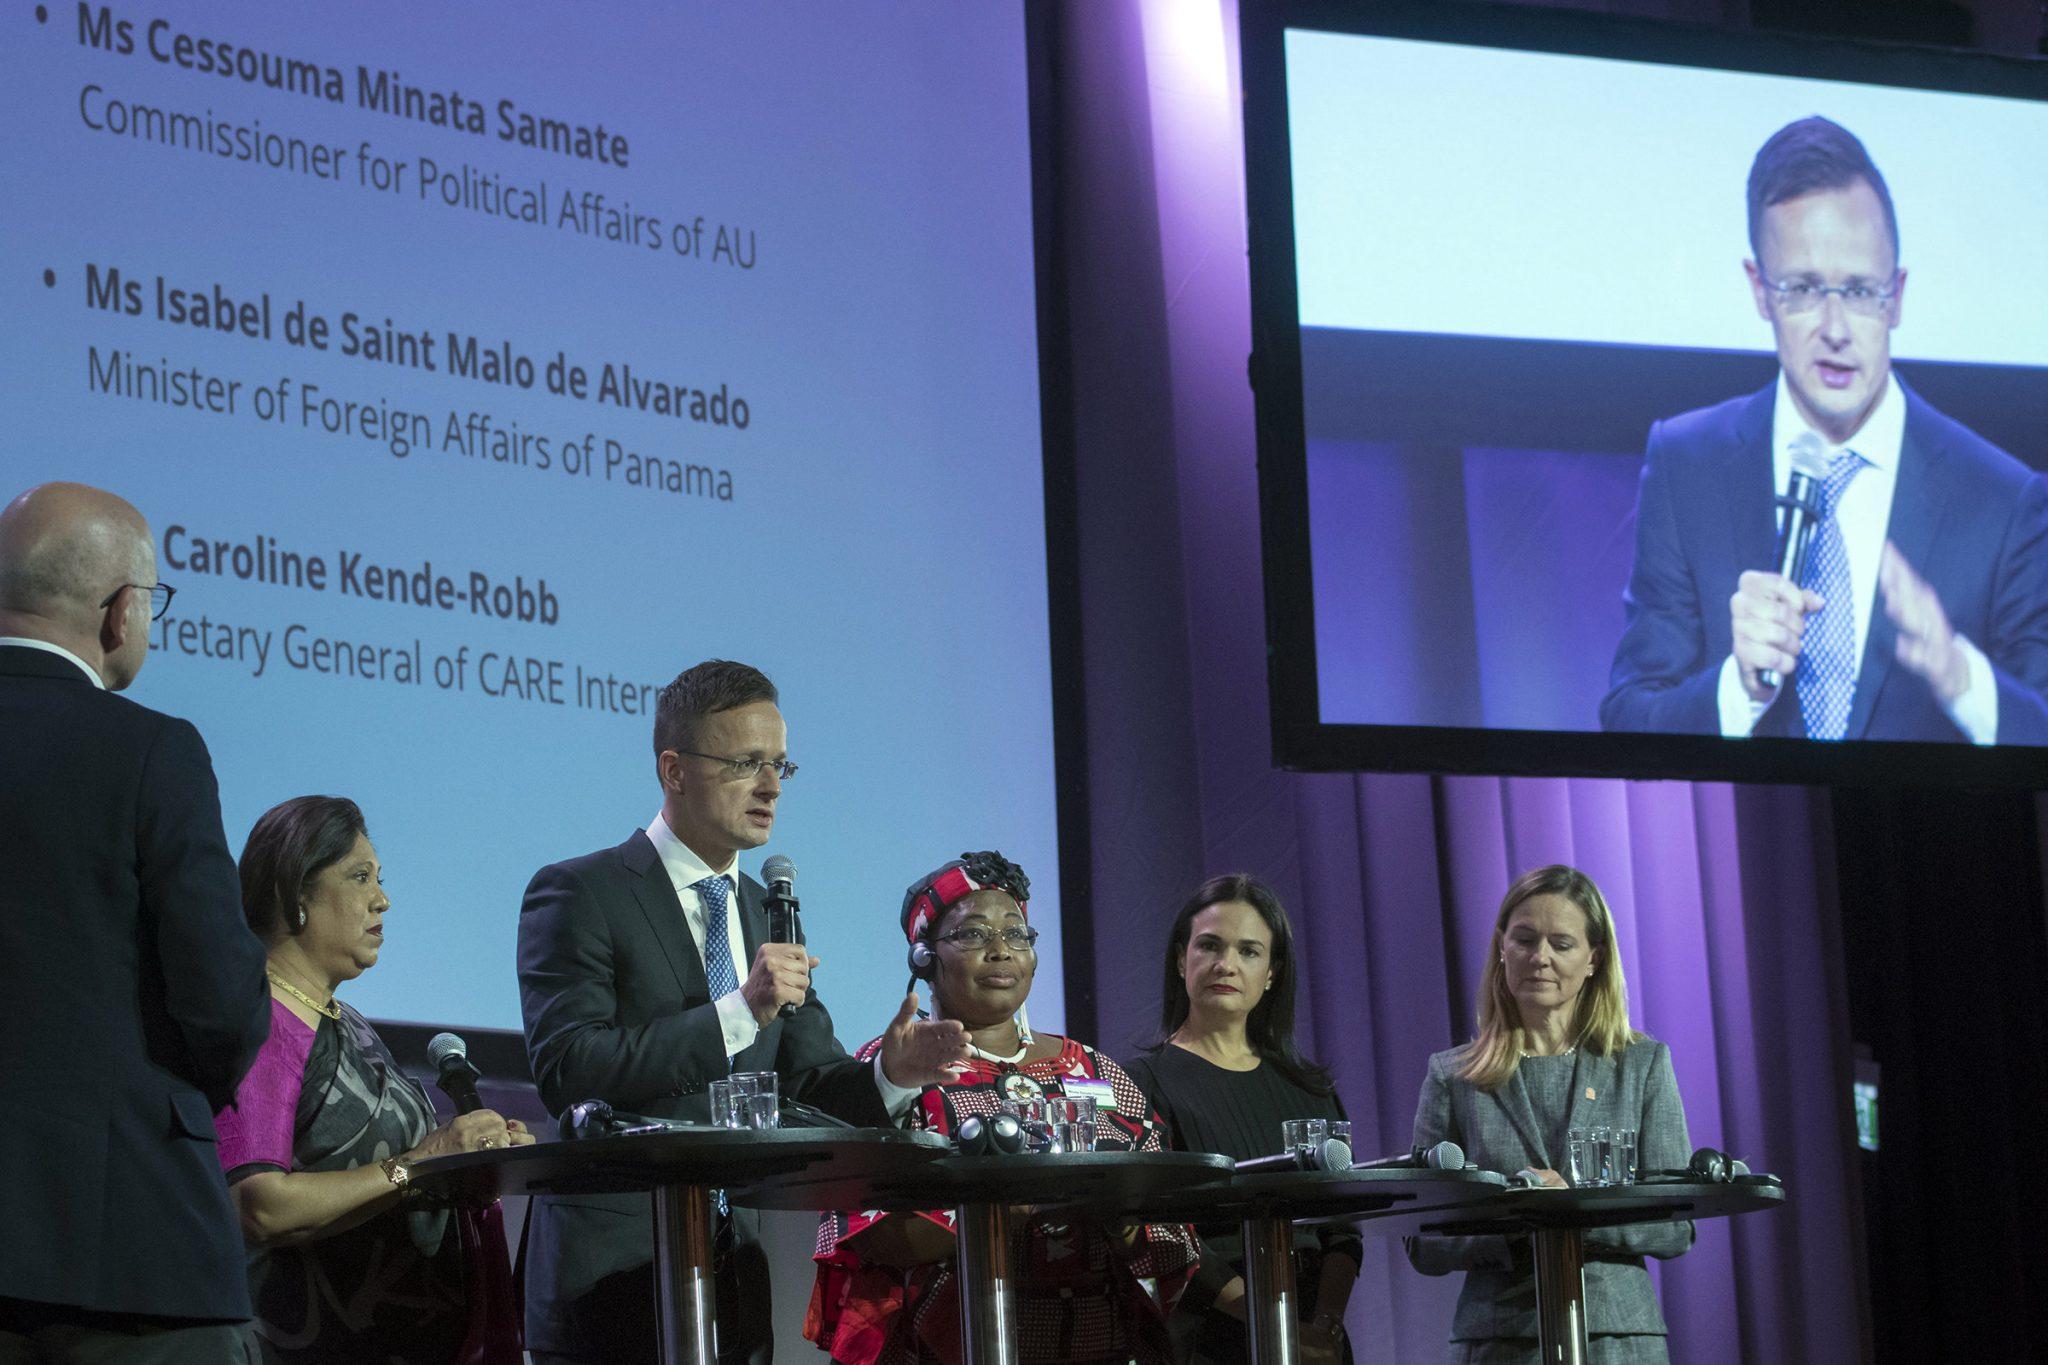 Szijjártó: Wartime Sexual Violence Must Not Be Left Unpunished post's picture